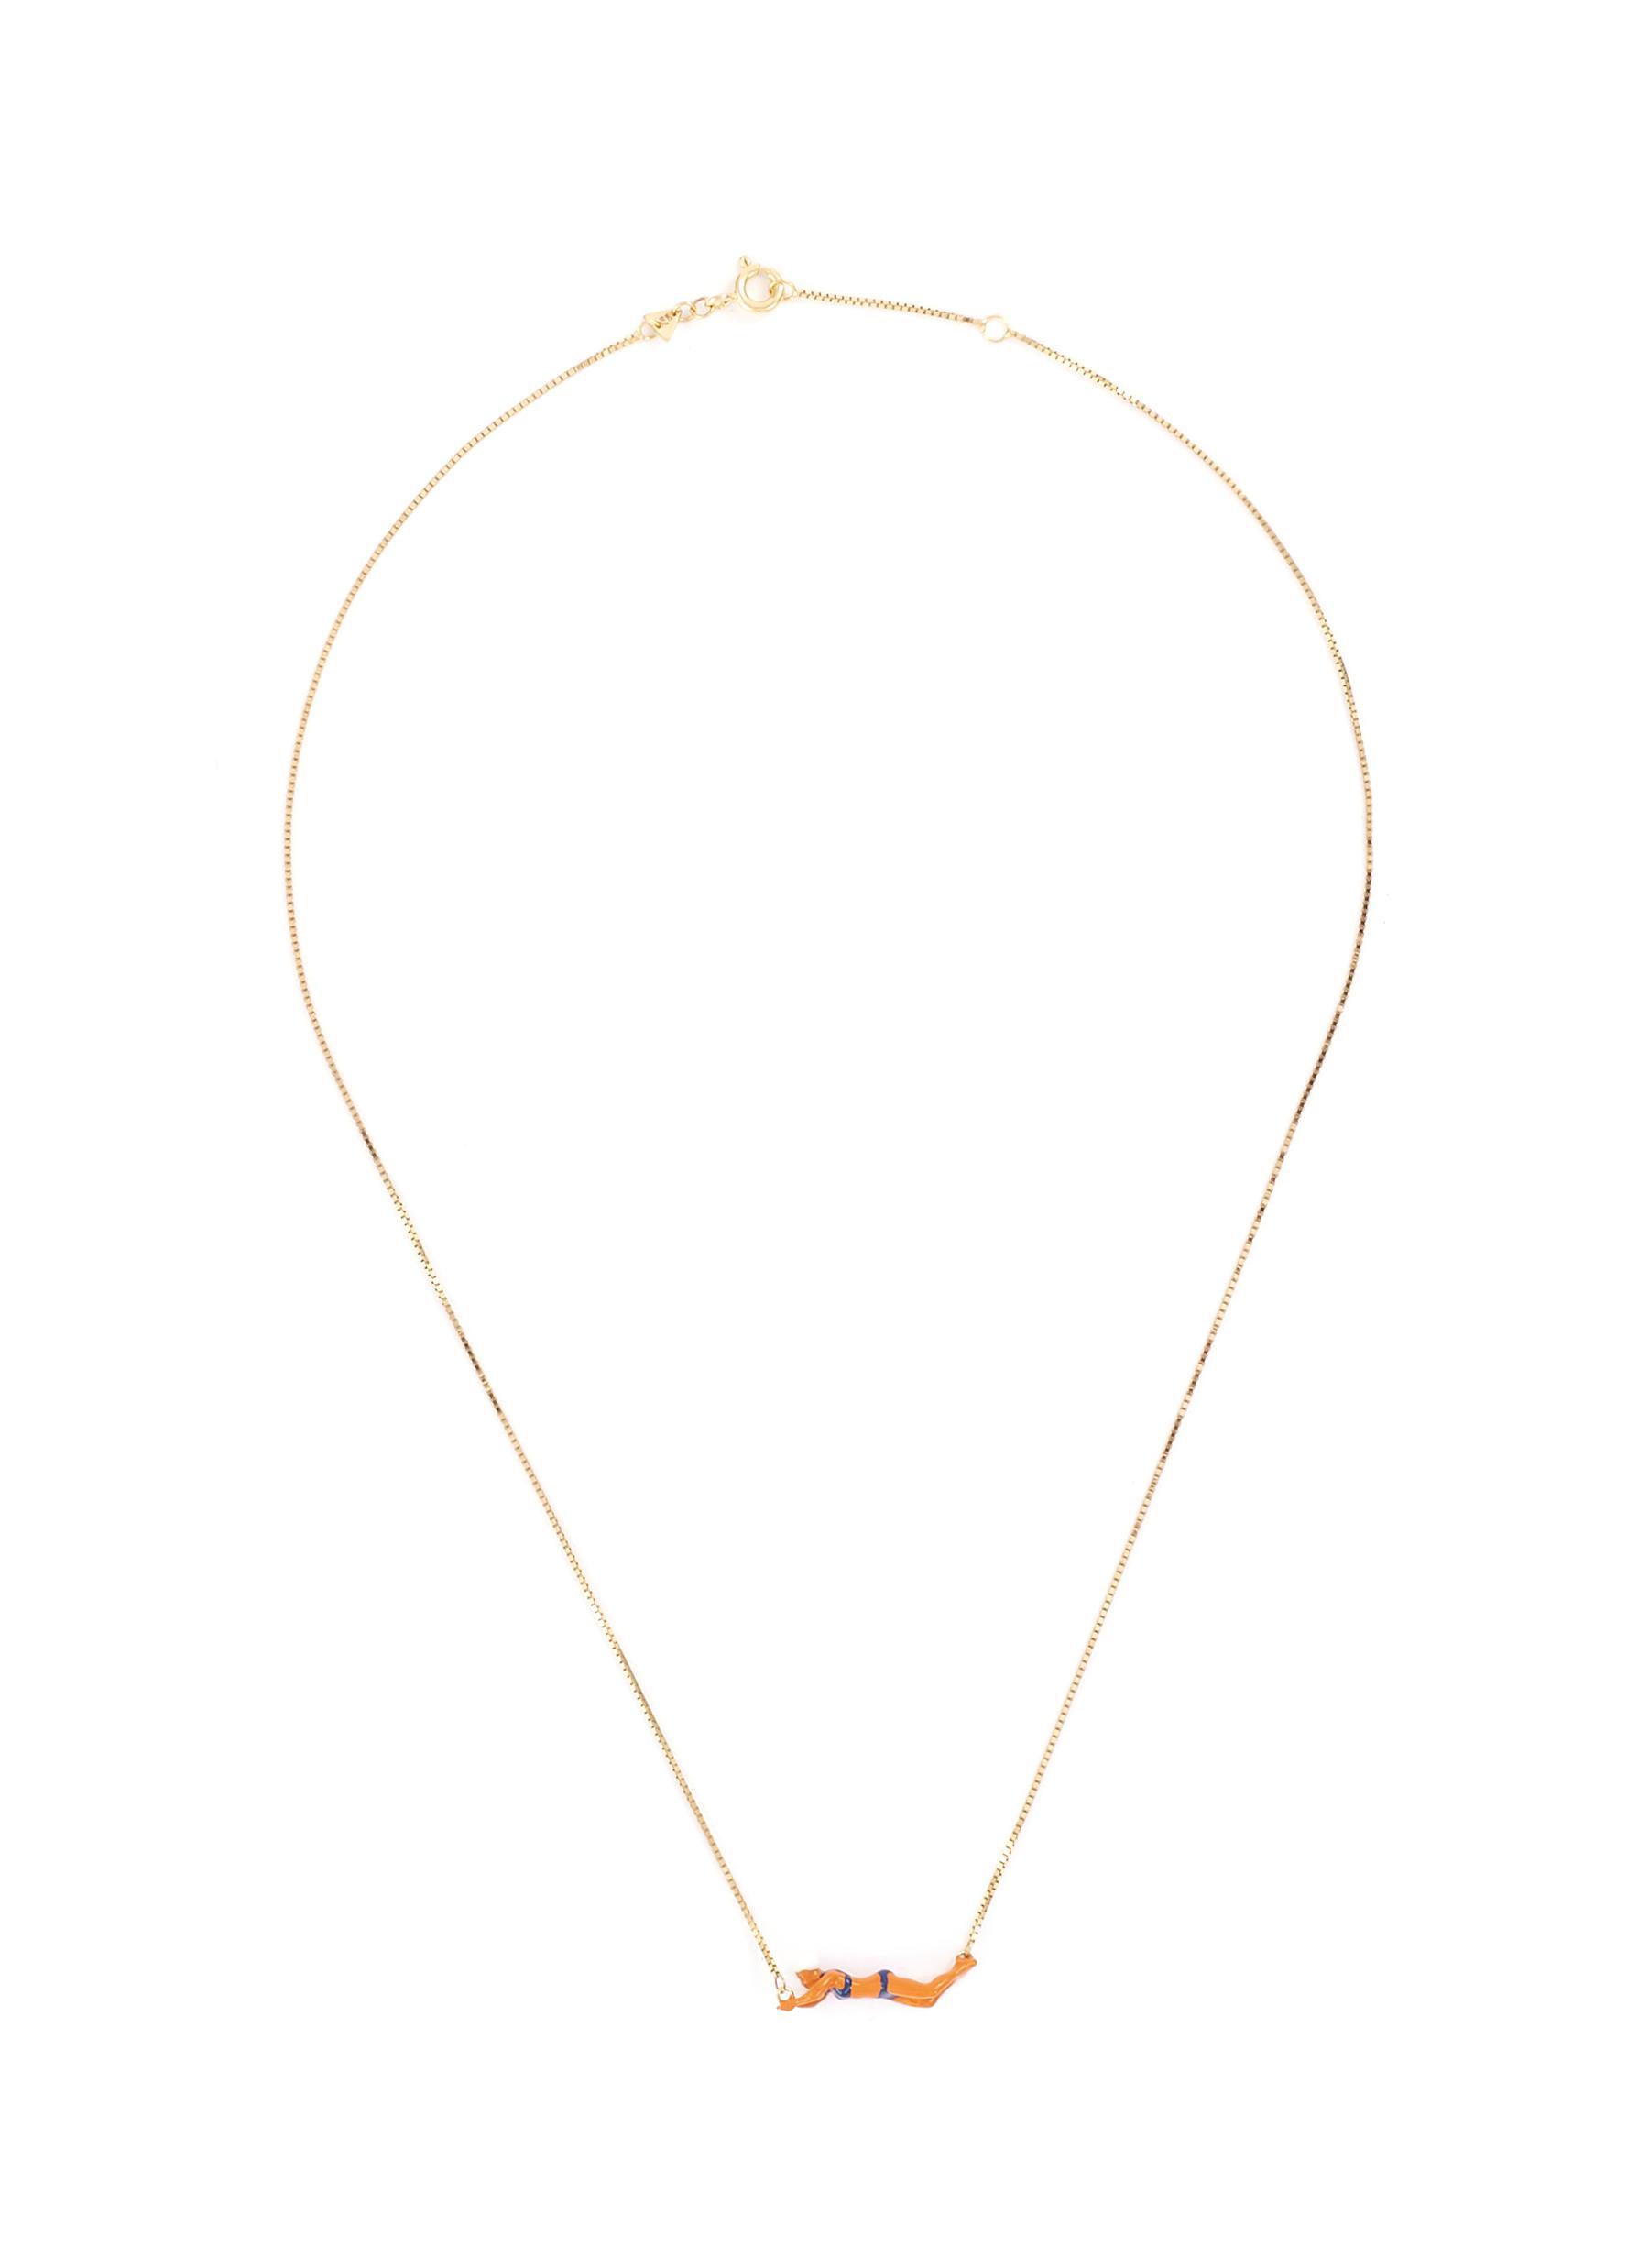 Aliita 'Nadadora Completo' swimmer pendant 9k yellow gold necklace